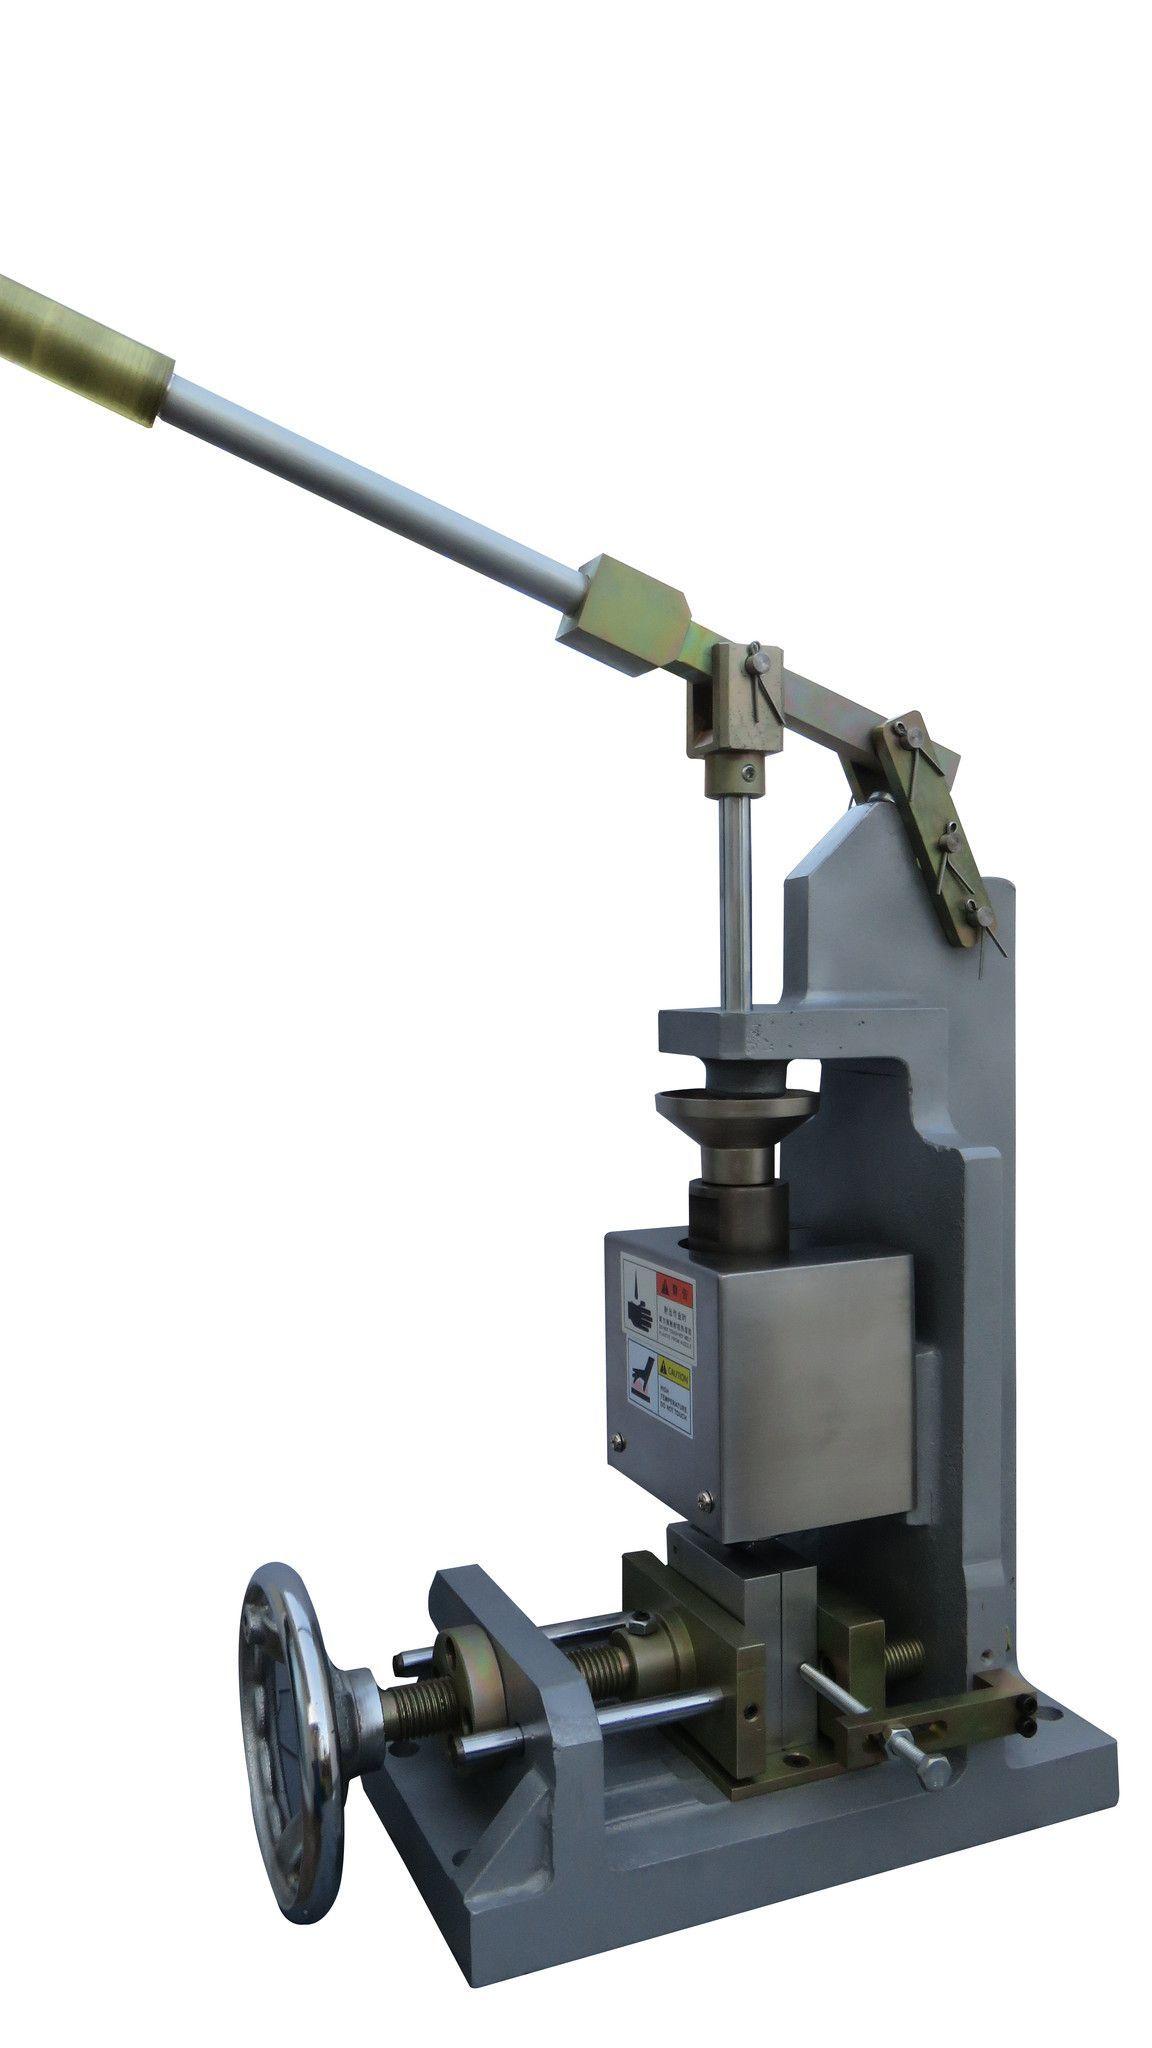 manual benchtop injection molding machine mim 100 inclu a standard rh pinterest com manual injection molding machine pdf manual injection molding machine price